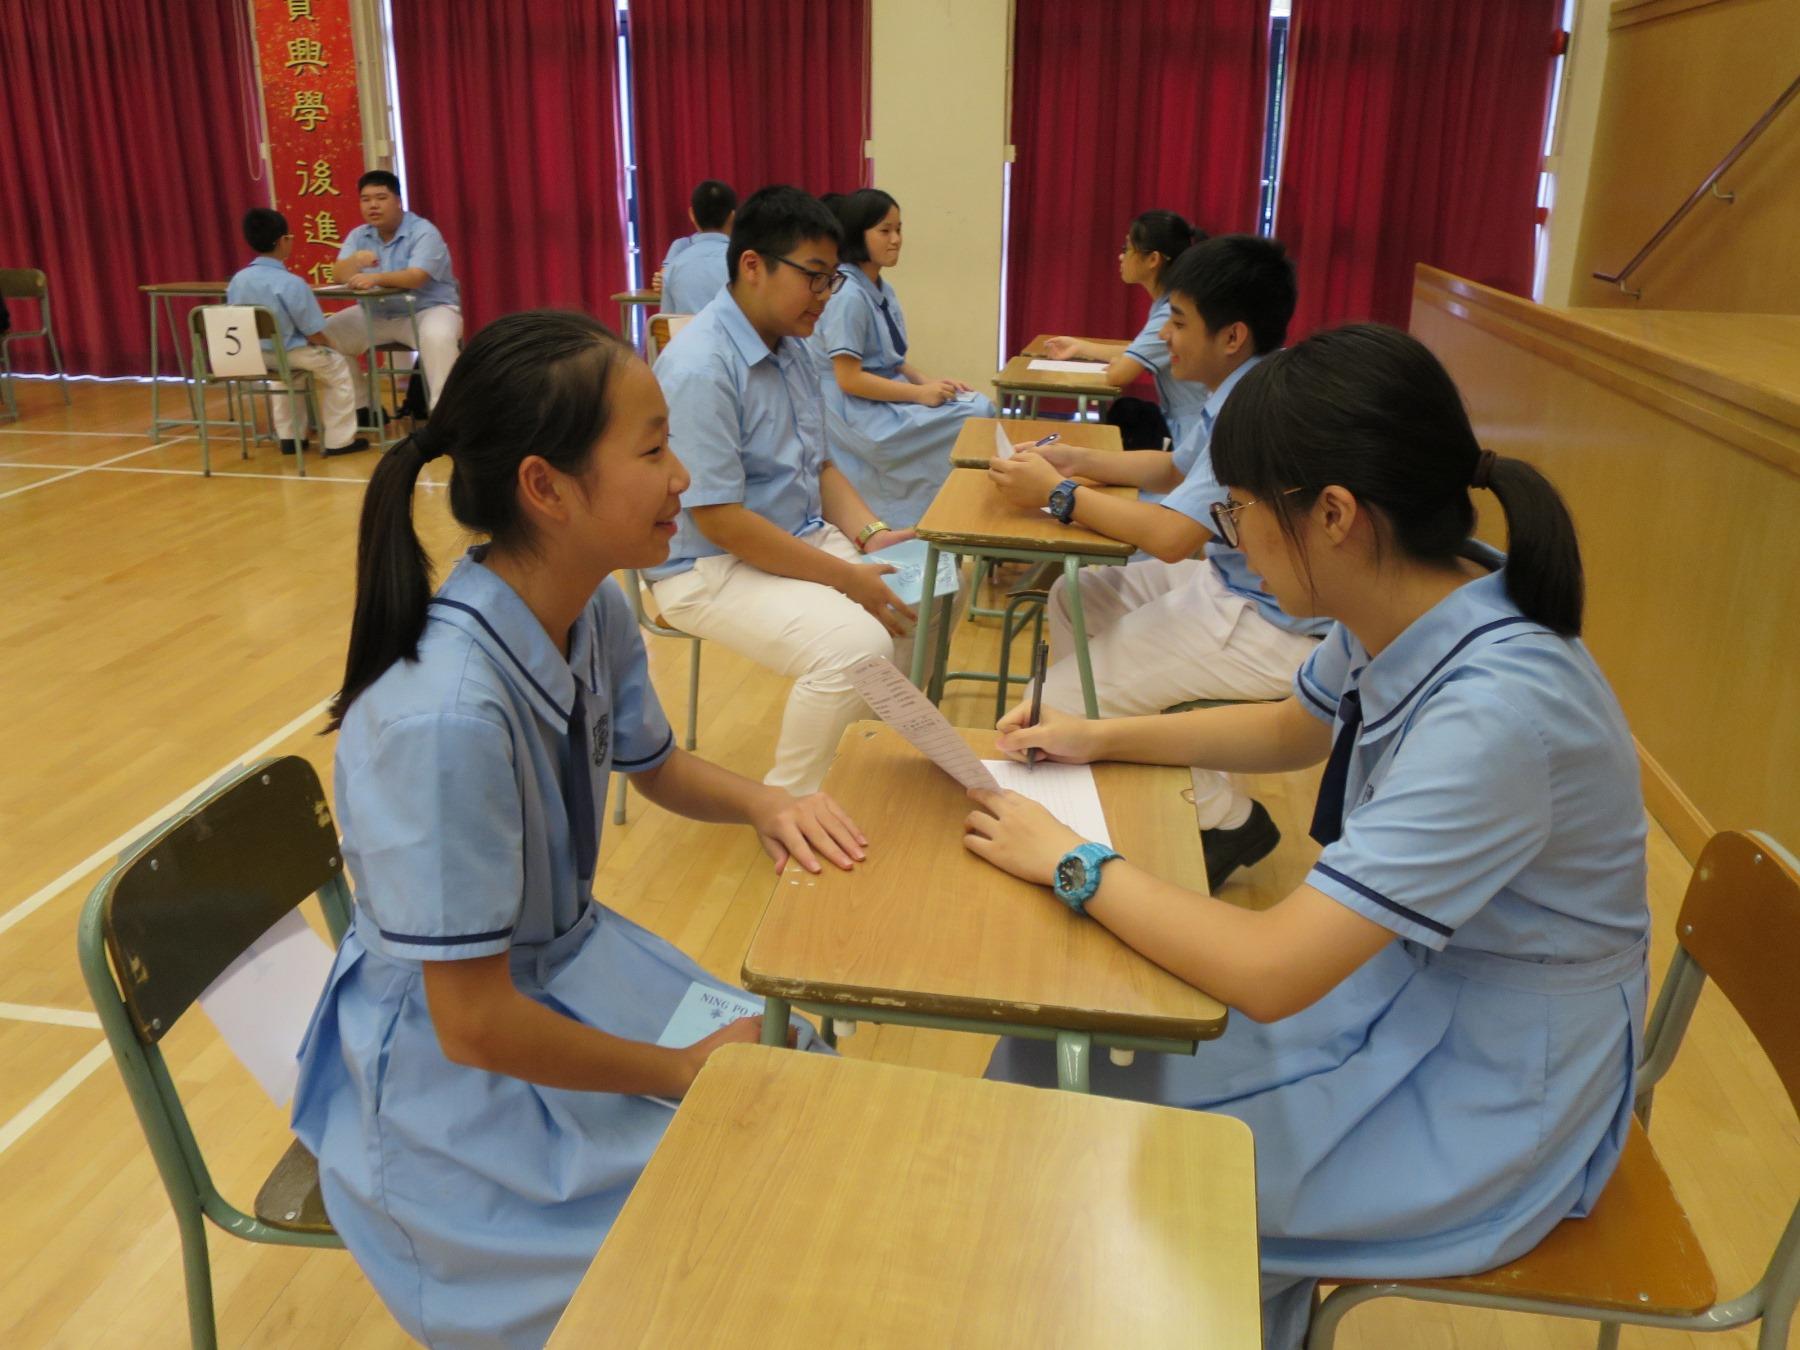 http://www.npc.edu.hk/sites/default/files/img_1860.jpg